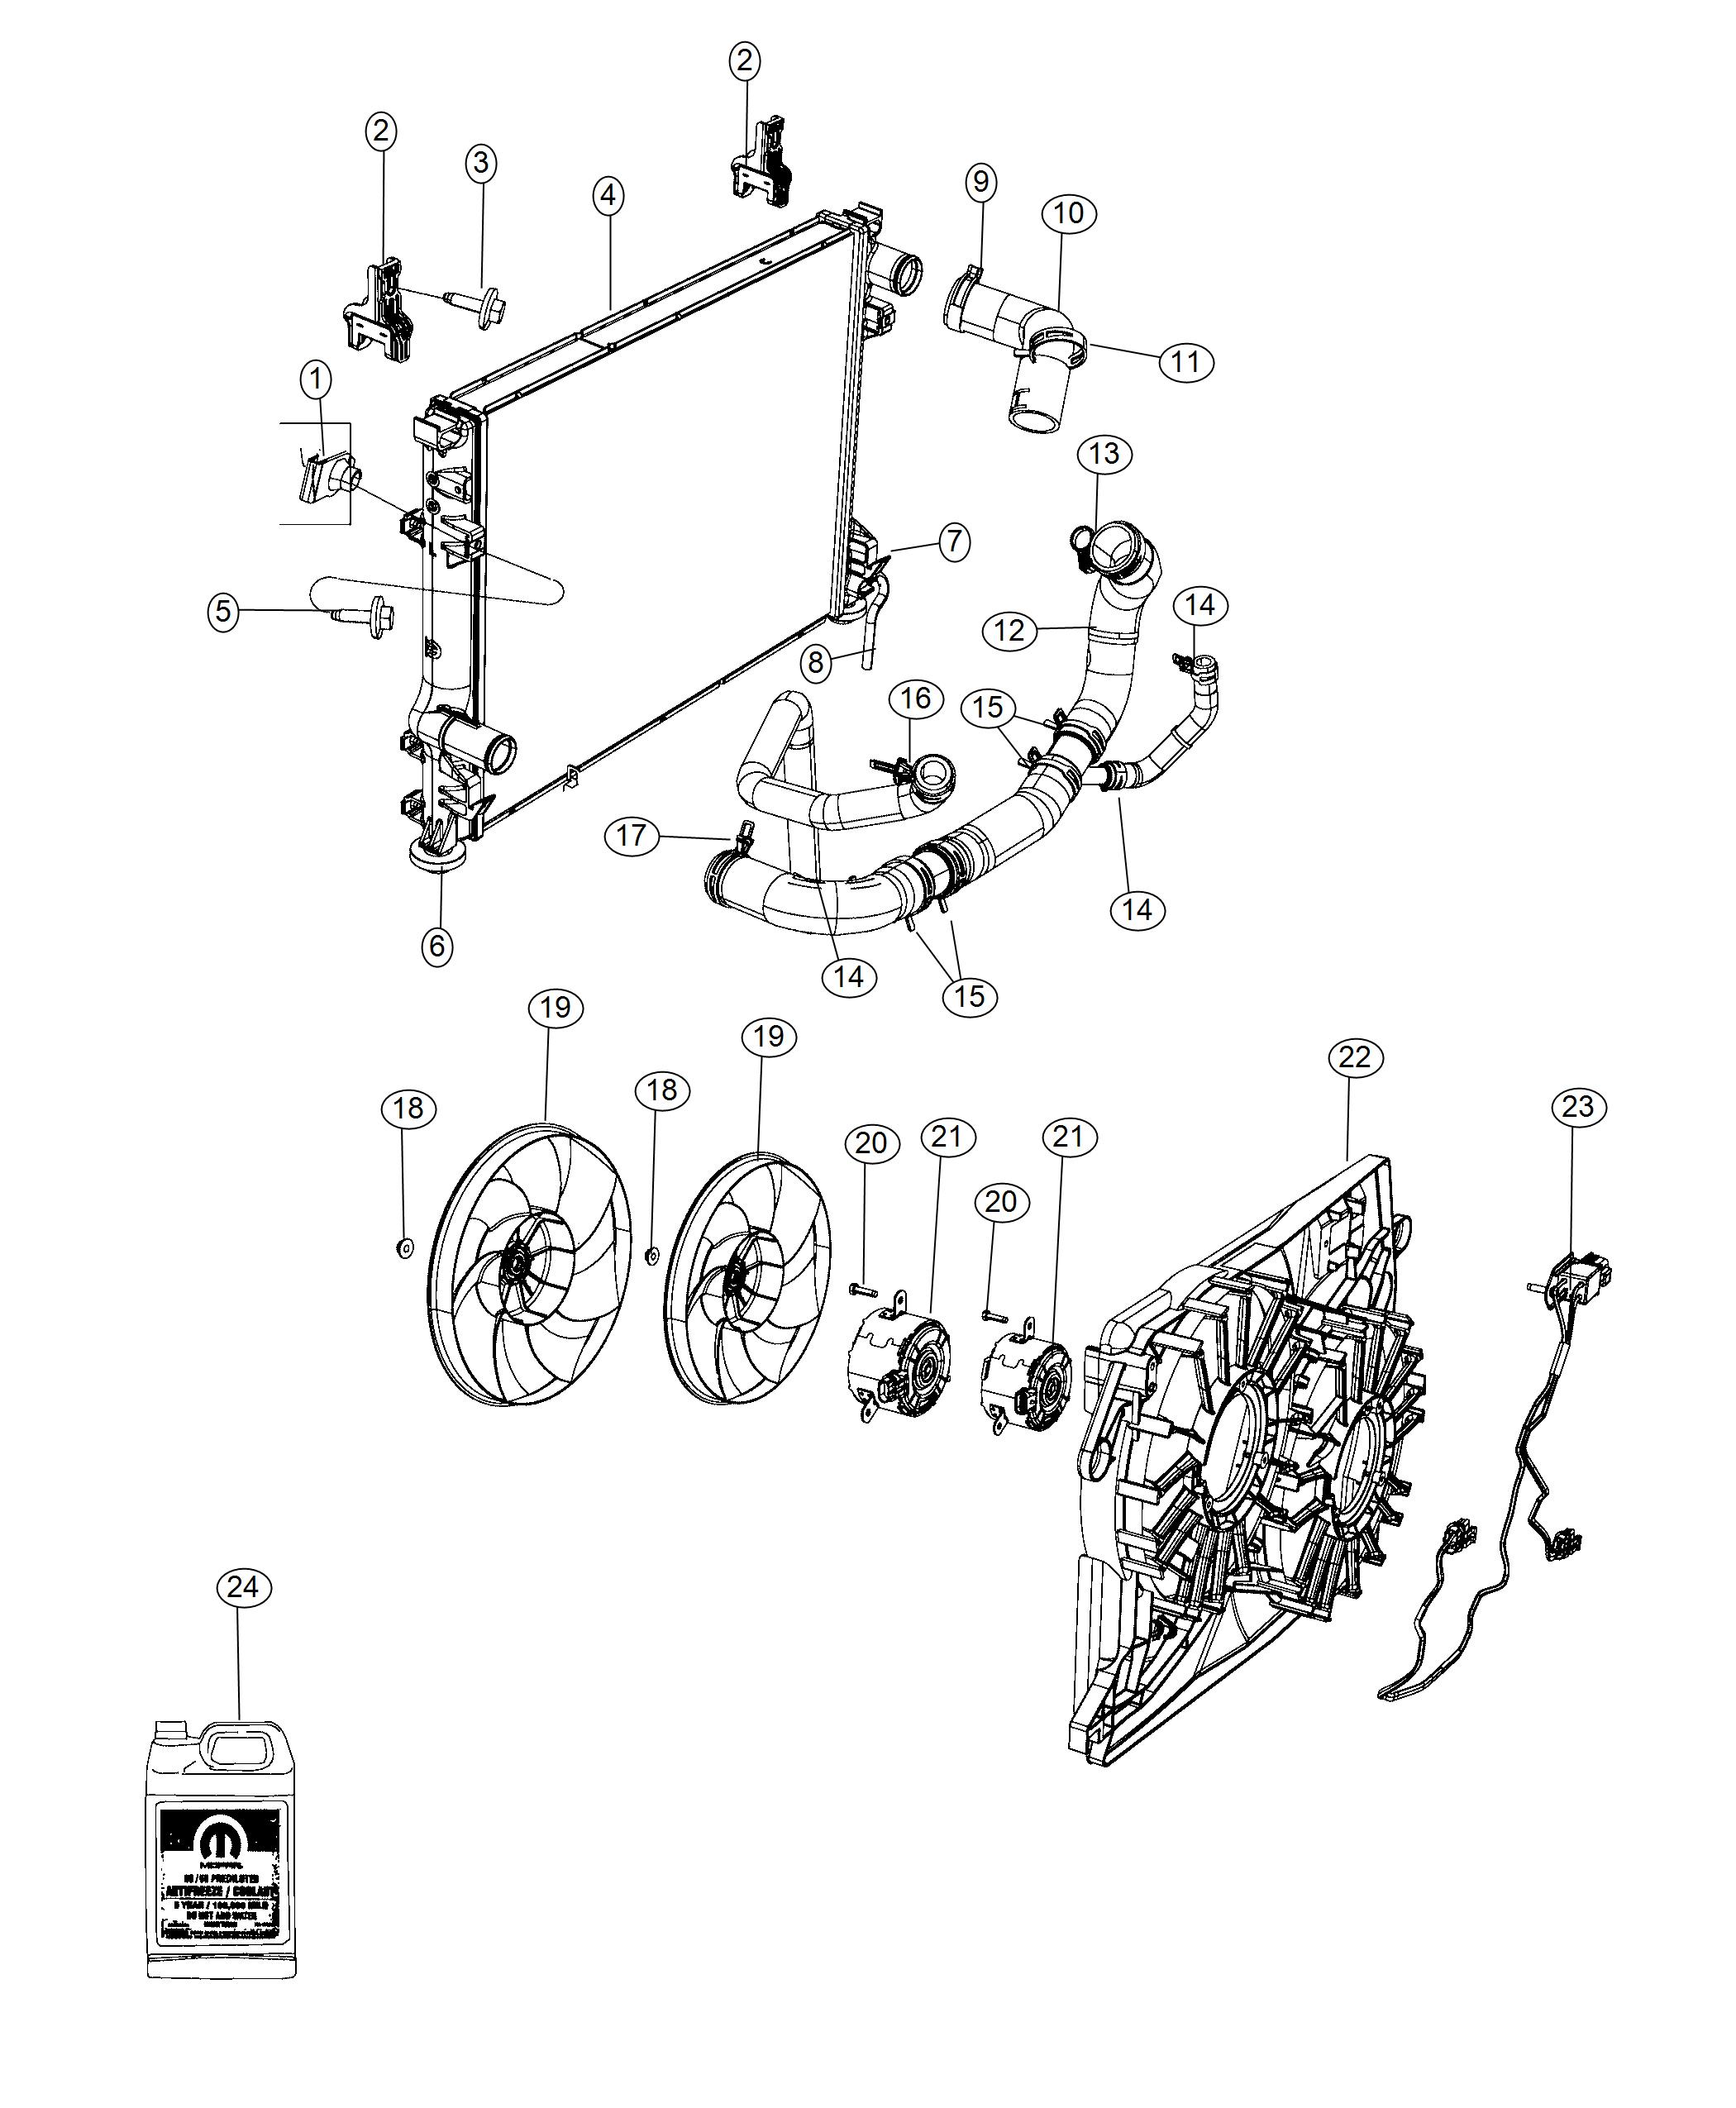 Dodge Challenger Hose Radiator Inlet Related Fan